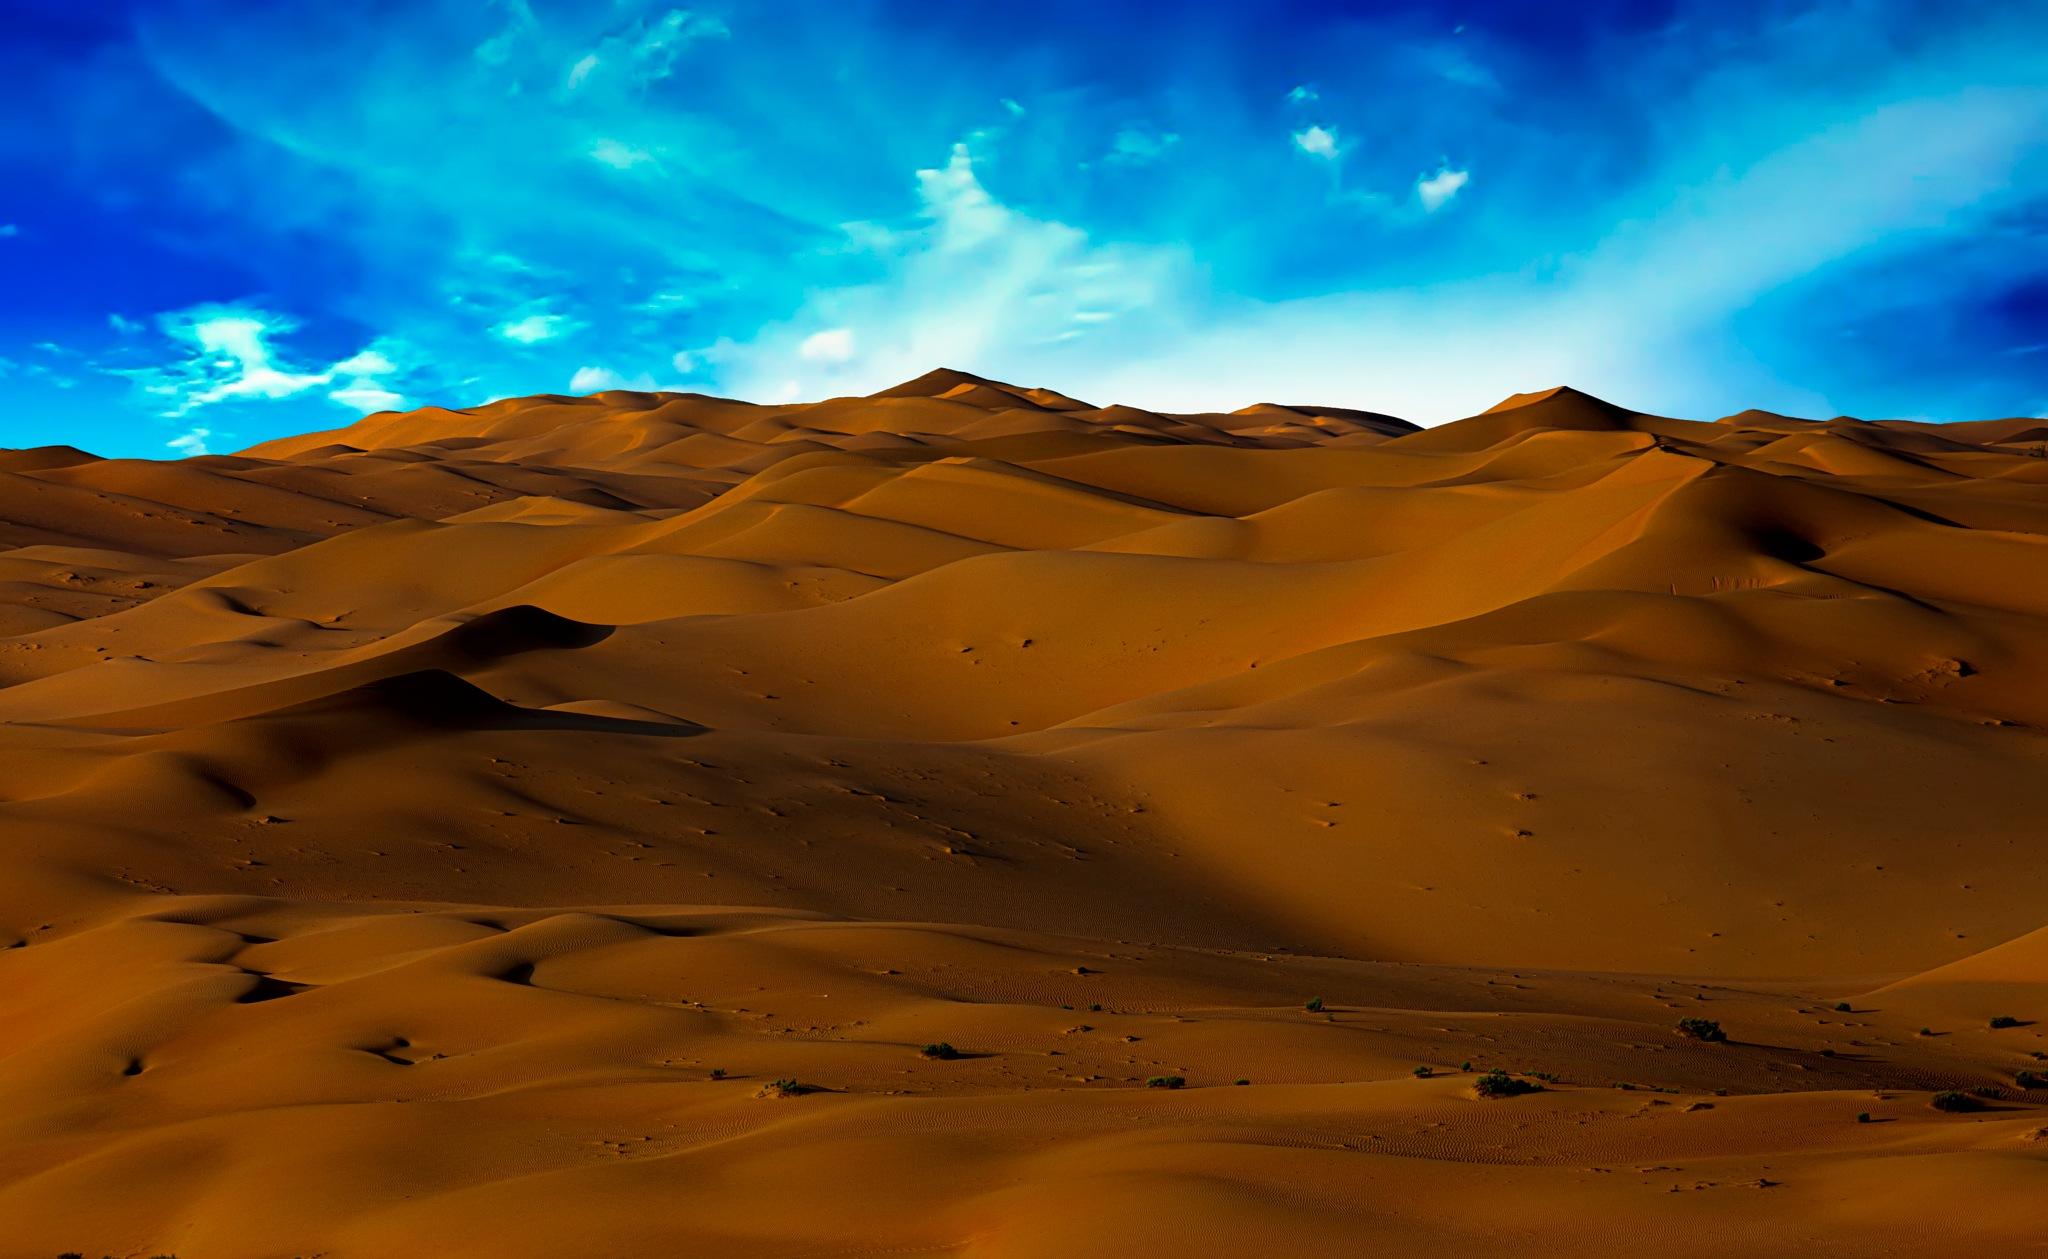 Desert & Sky by TAMER RADWAN